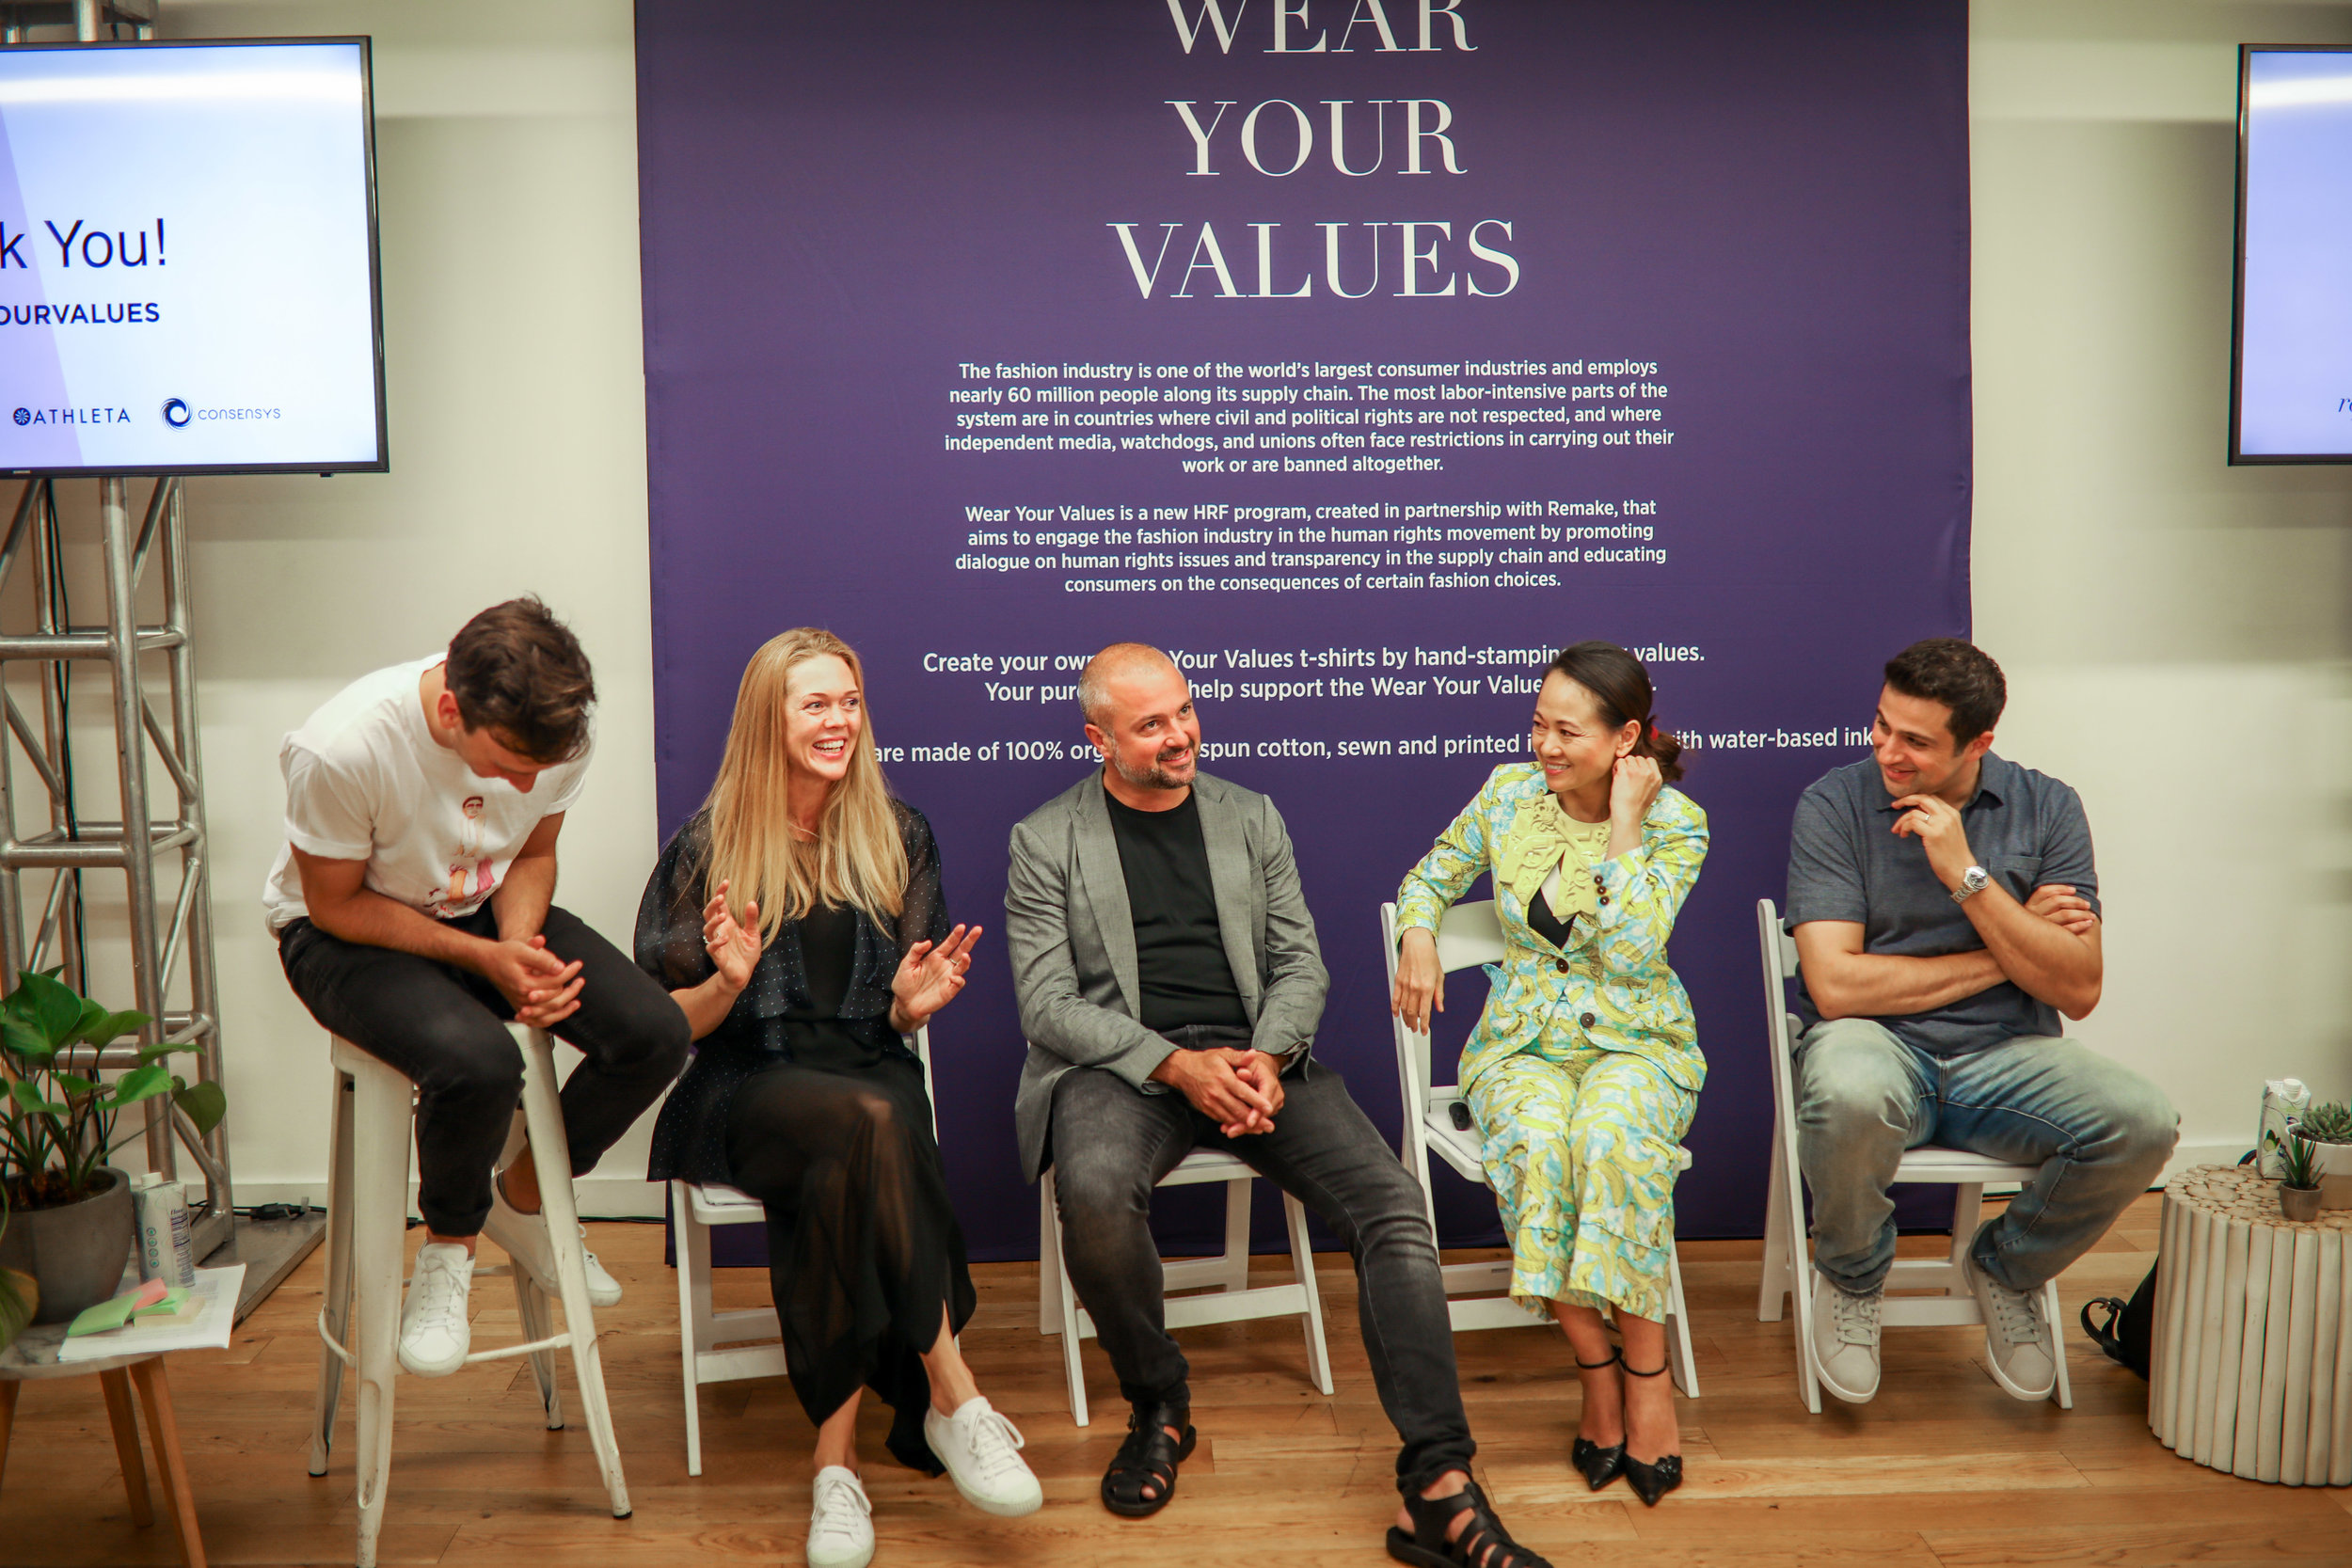 Martine Jarlgaard elaborates on a panel about blockchain and tech featuring Leonardo Bonanni ( SourceMap ), LanVy Nguyen ( Fashion 4 Freedom ), Mounir Ibrahim ( True Pic ) and Ben Siegel ( ConsenSys ).